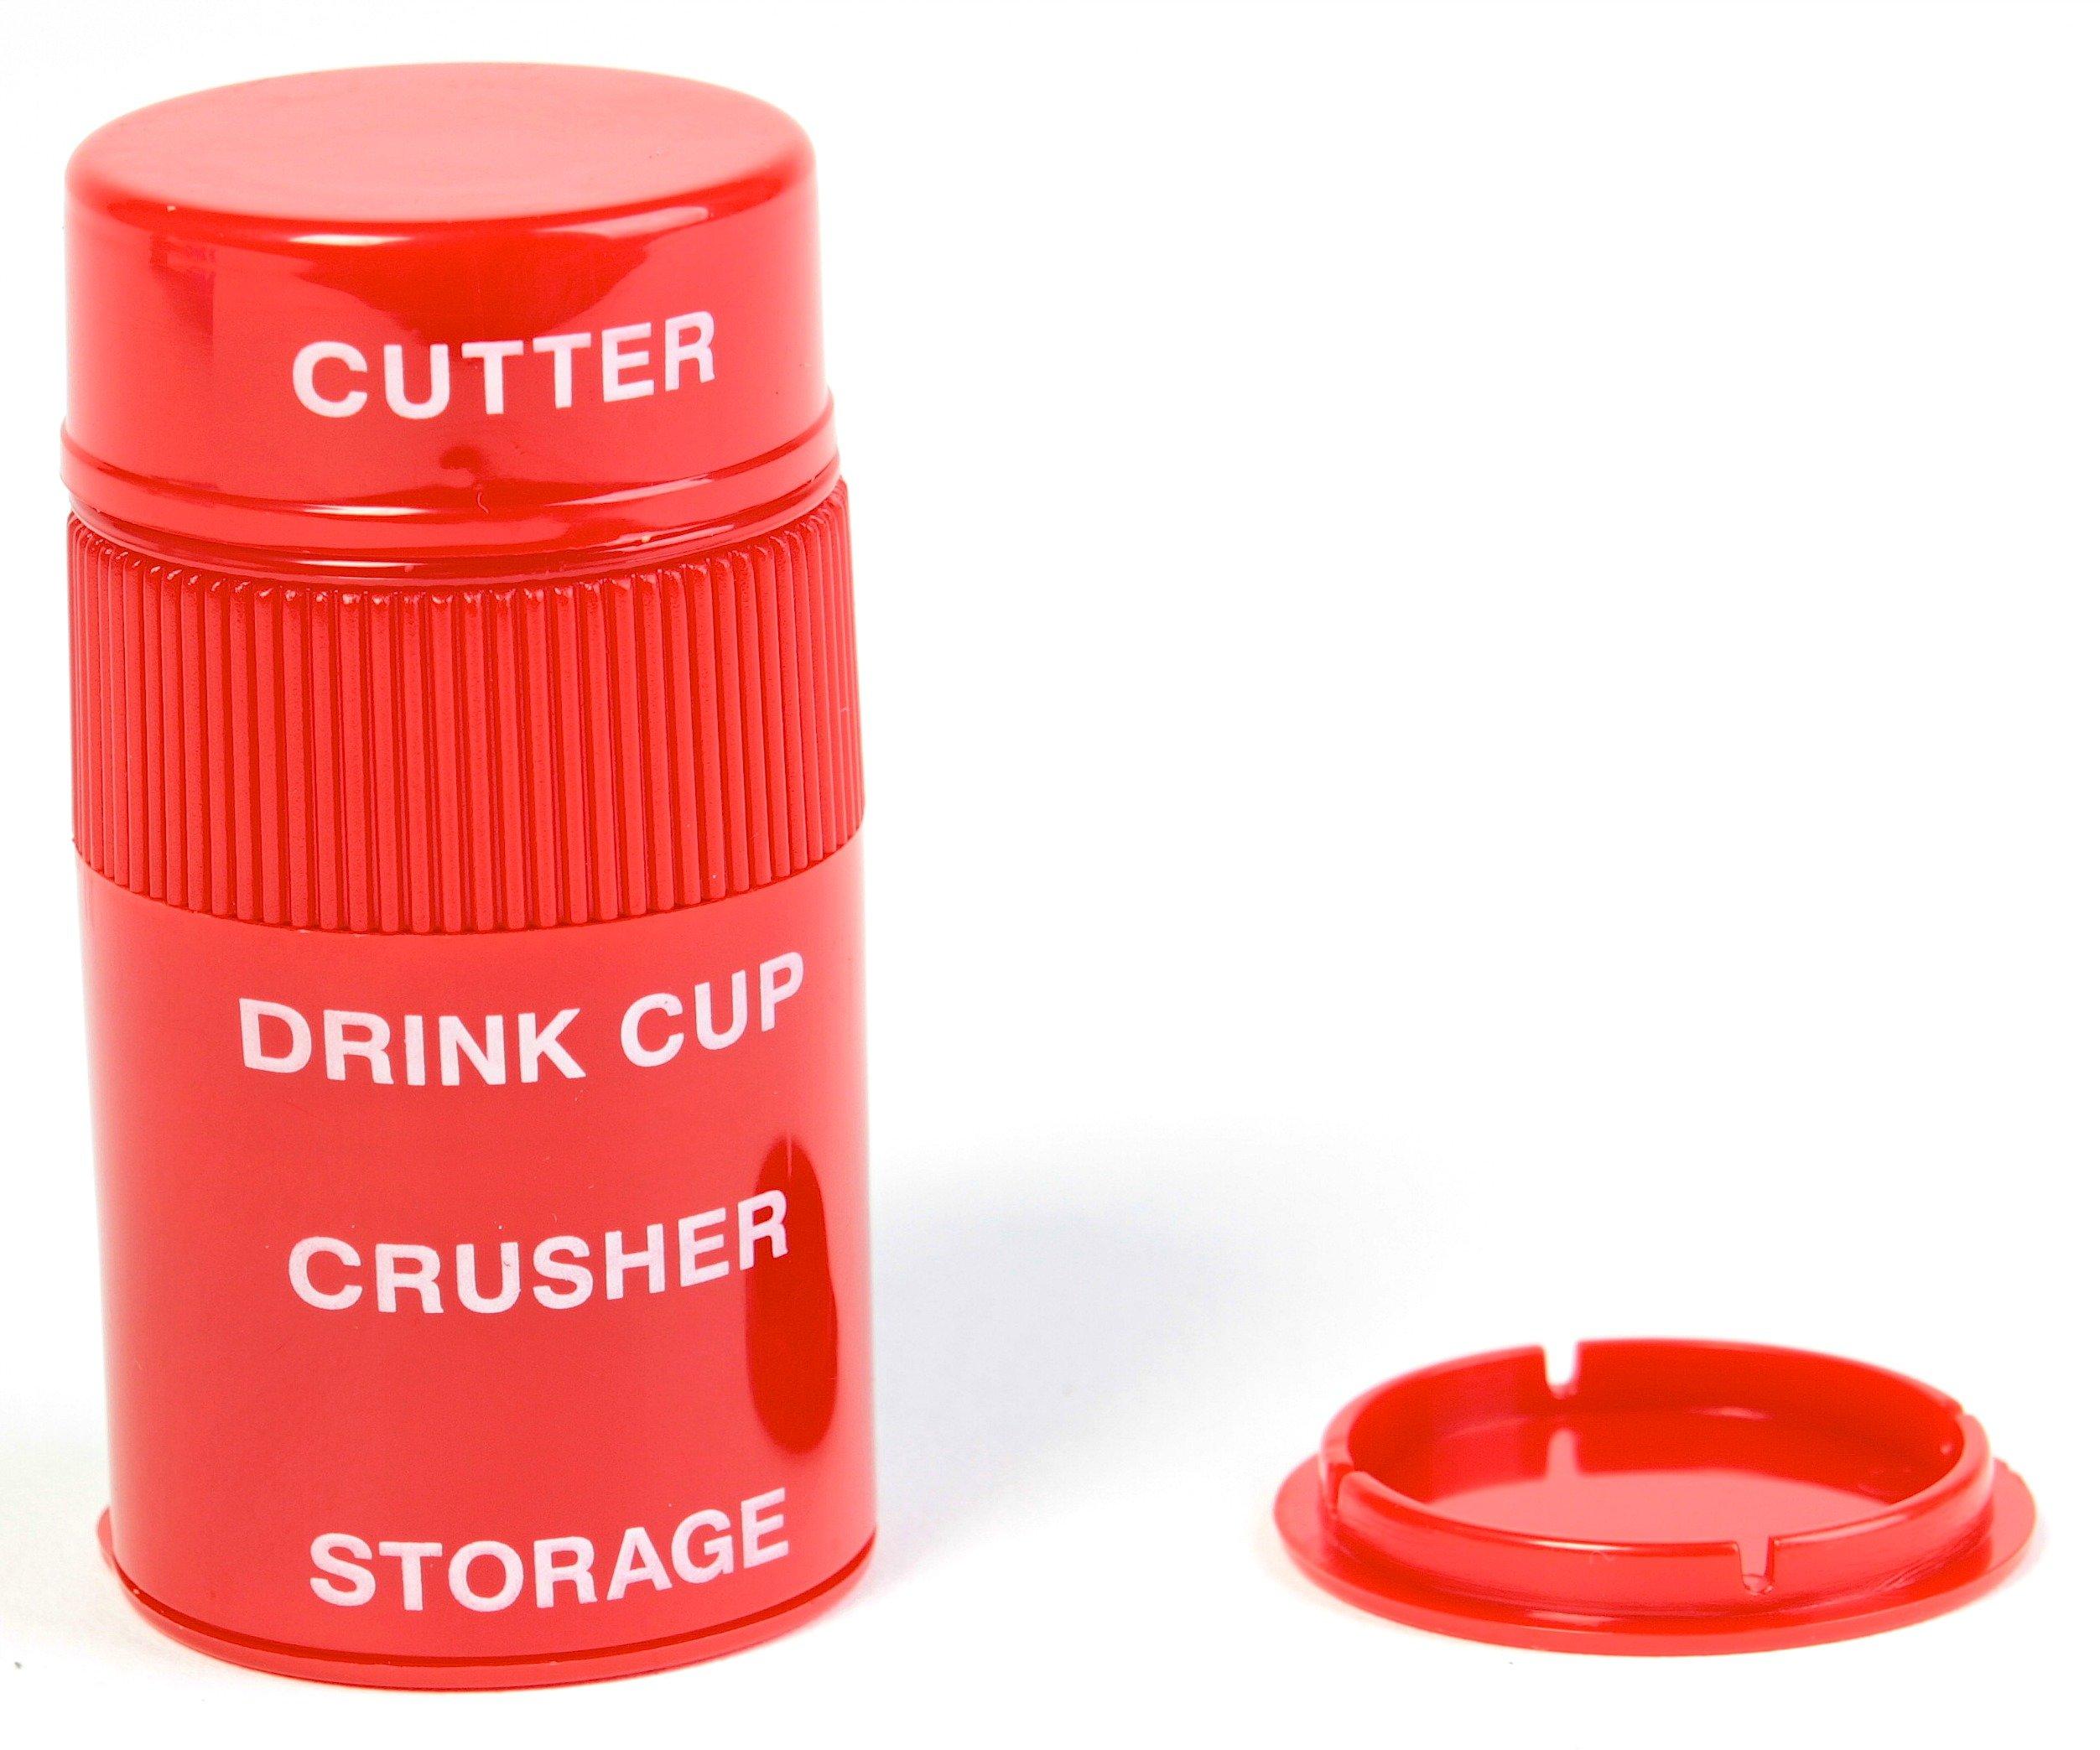 Ezy-dose Ultra Fine Cut and Crush Pill Splitter and Crusher, 6-pack